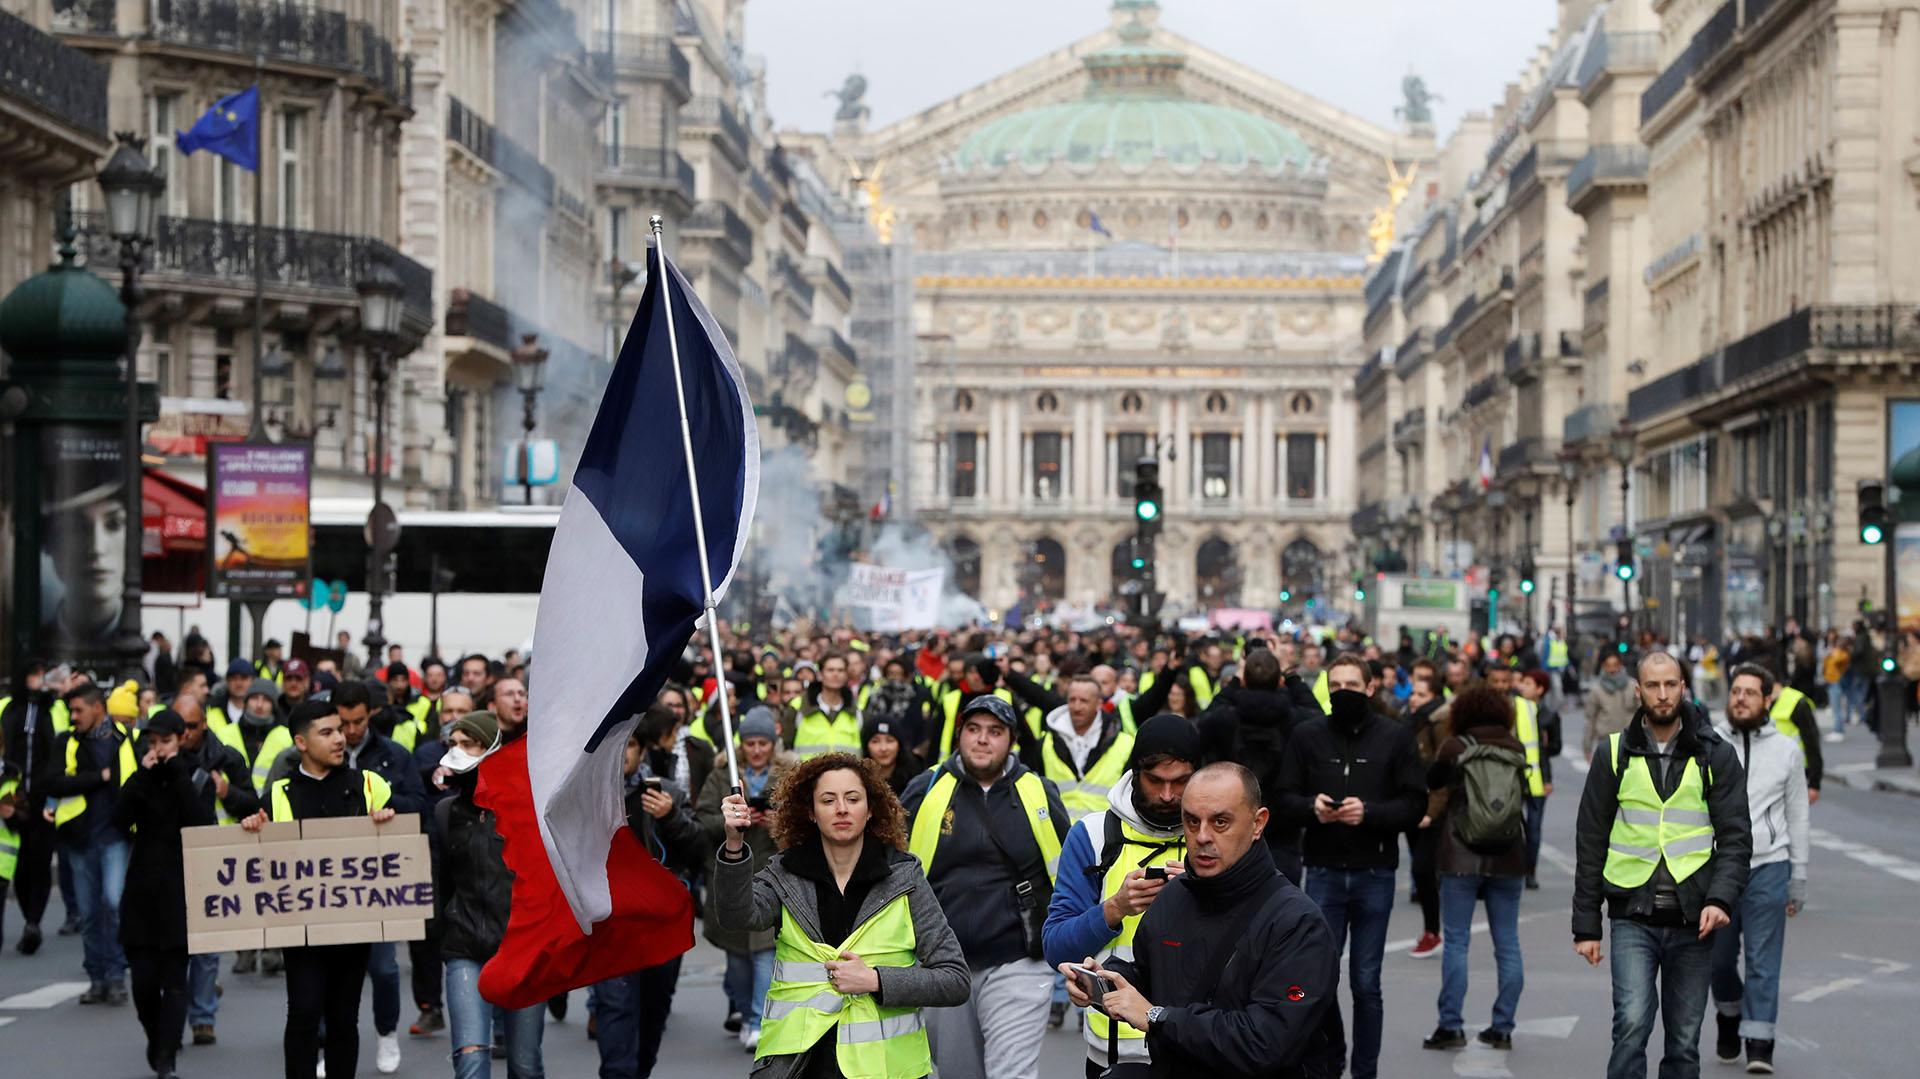 (Photo by FRANCOIS GUILLOT / AFP)